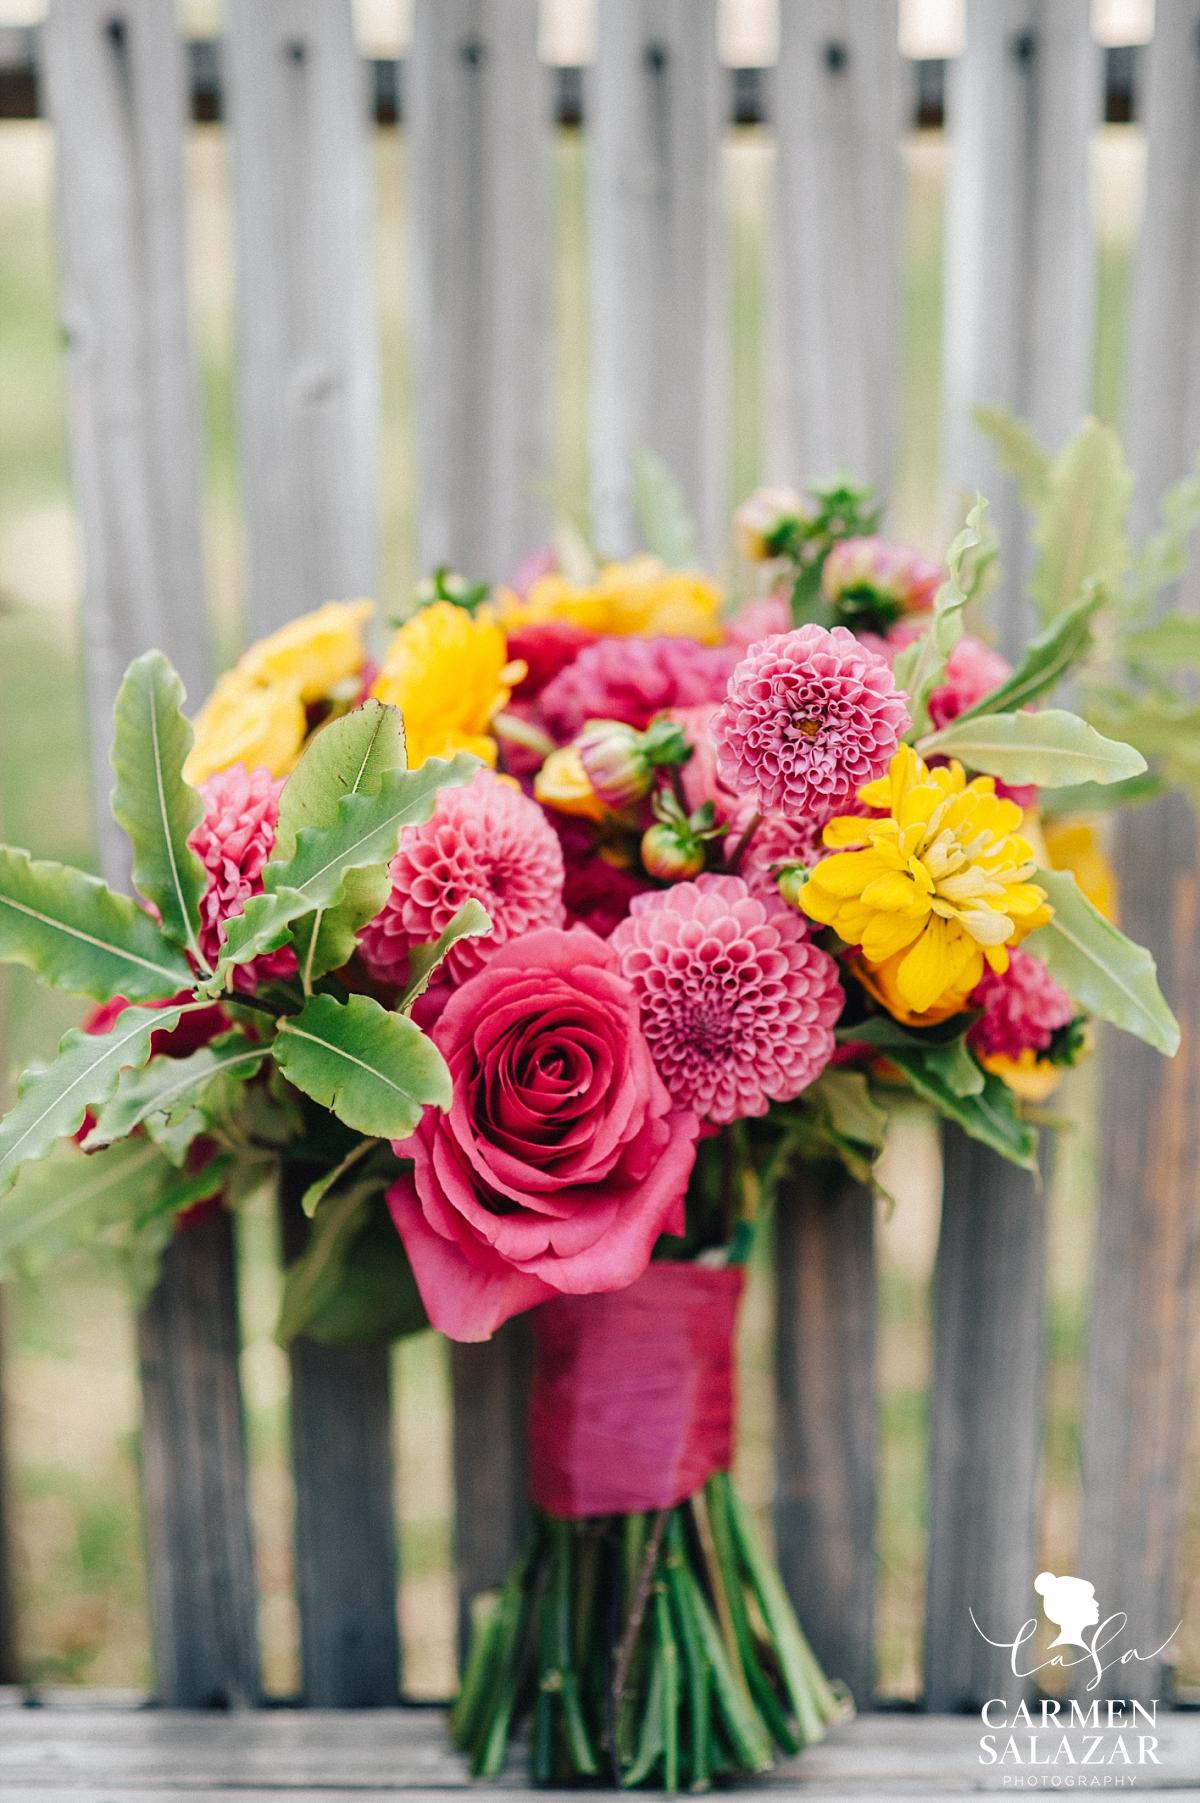 Gorgeous neon wedding bouquet by Melody Raye Flowers - Carmen Salazar